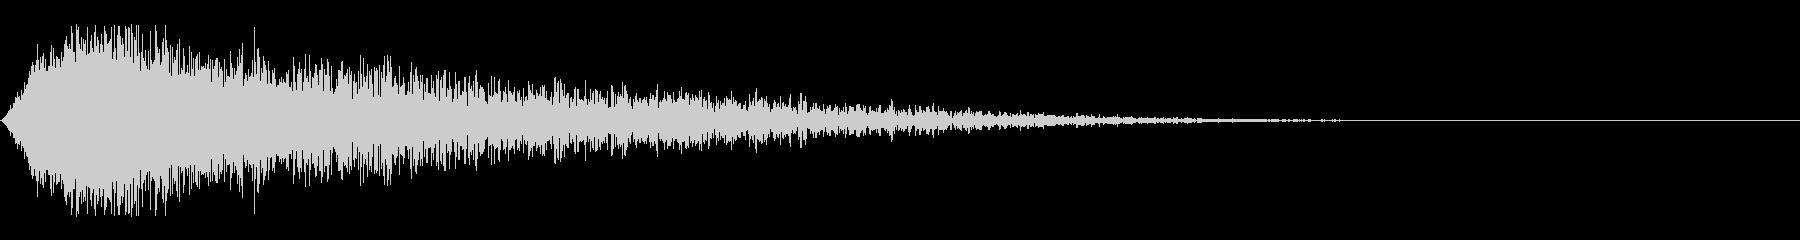 Dark_Attack-44の未再生の波形